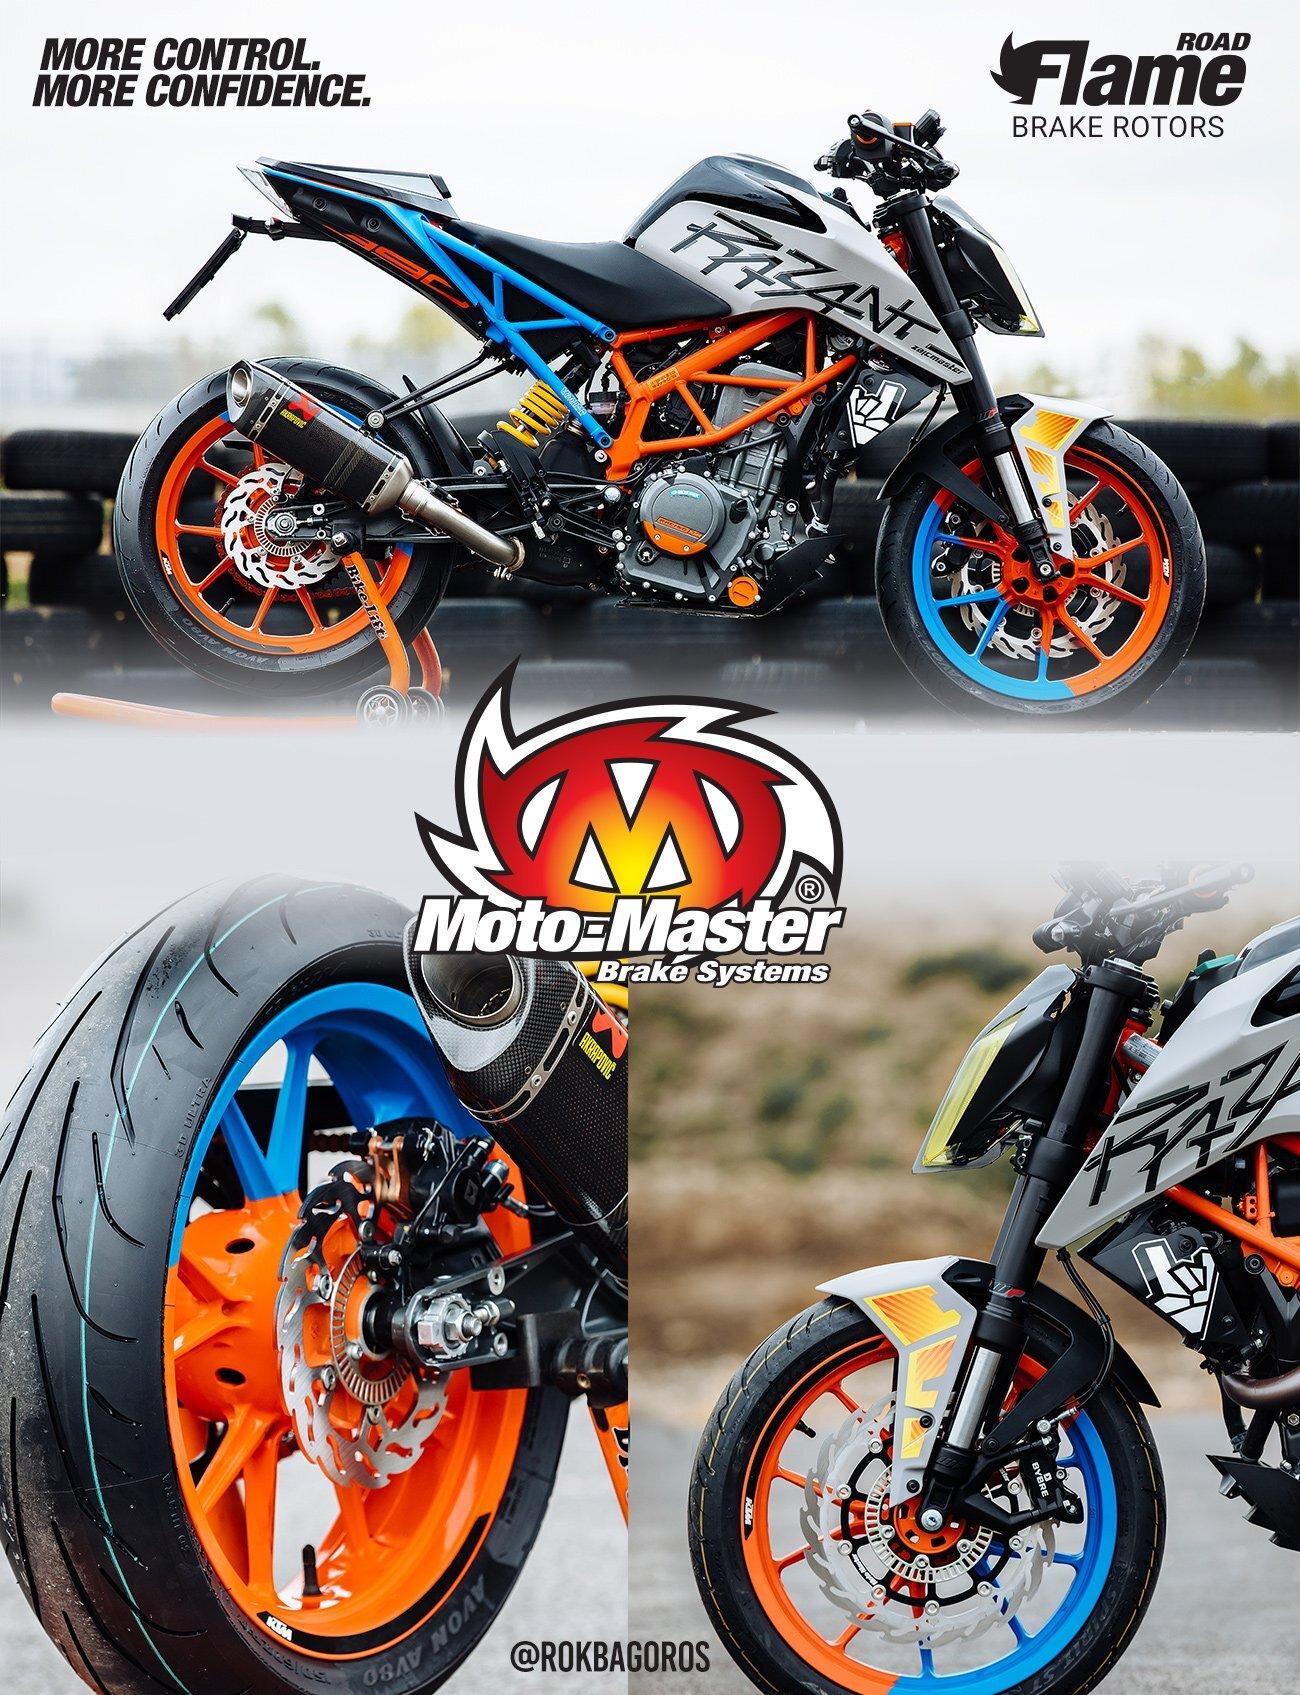 112297 Moto Master - FRONT FLAME FLOATING ALU DISC 320 mm